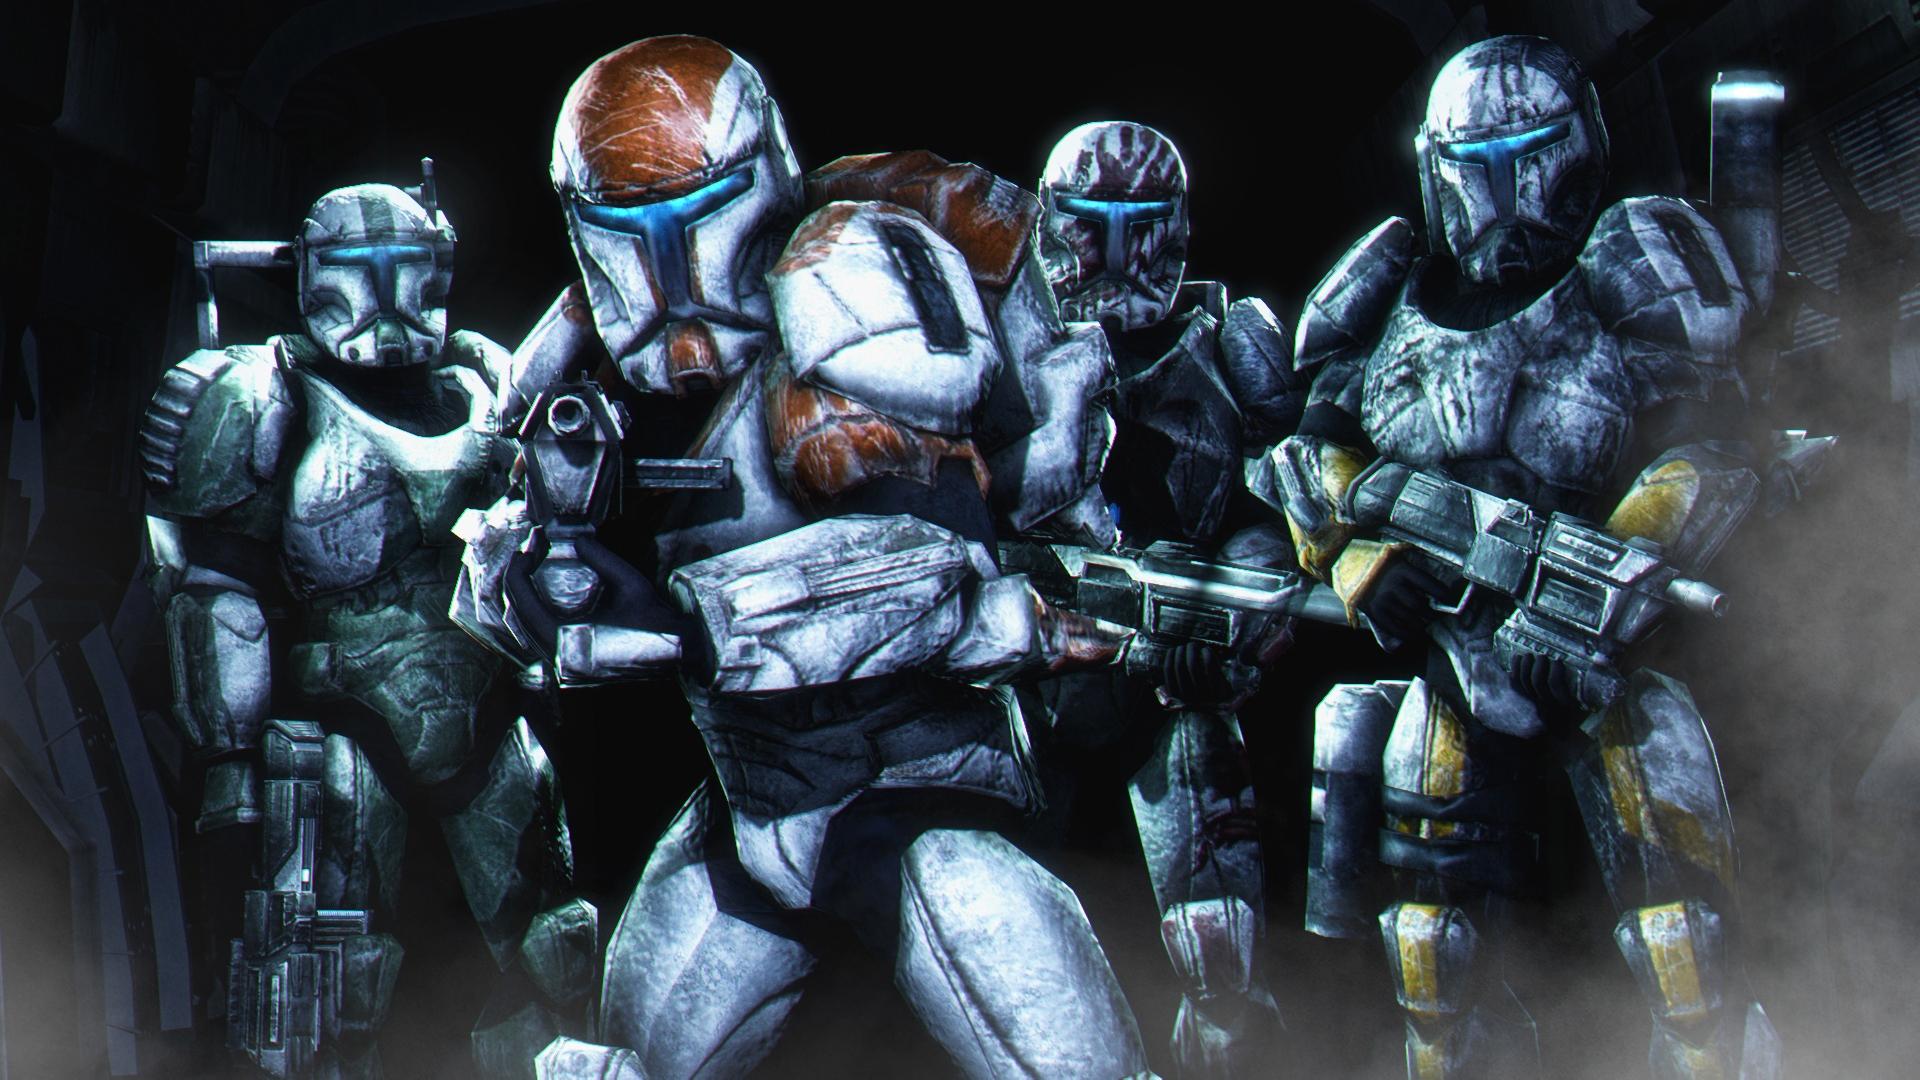 Republic Commando by AngryRabbitGmoD